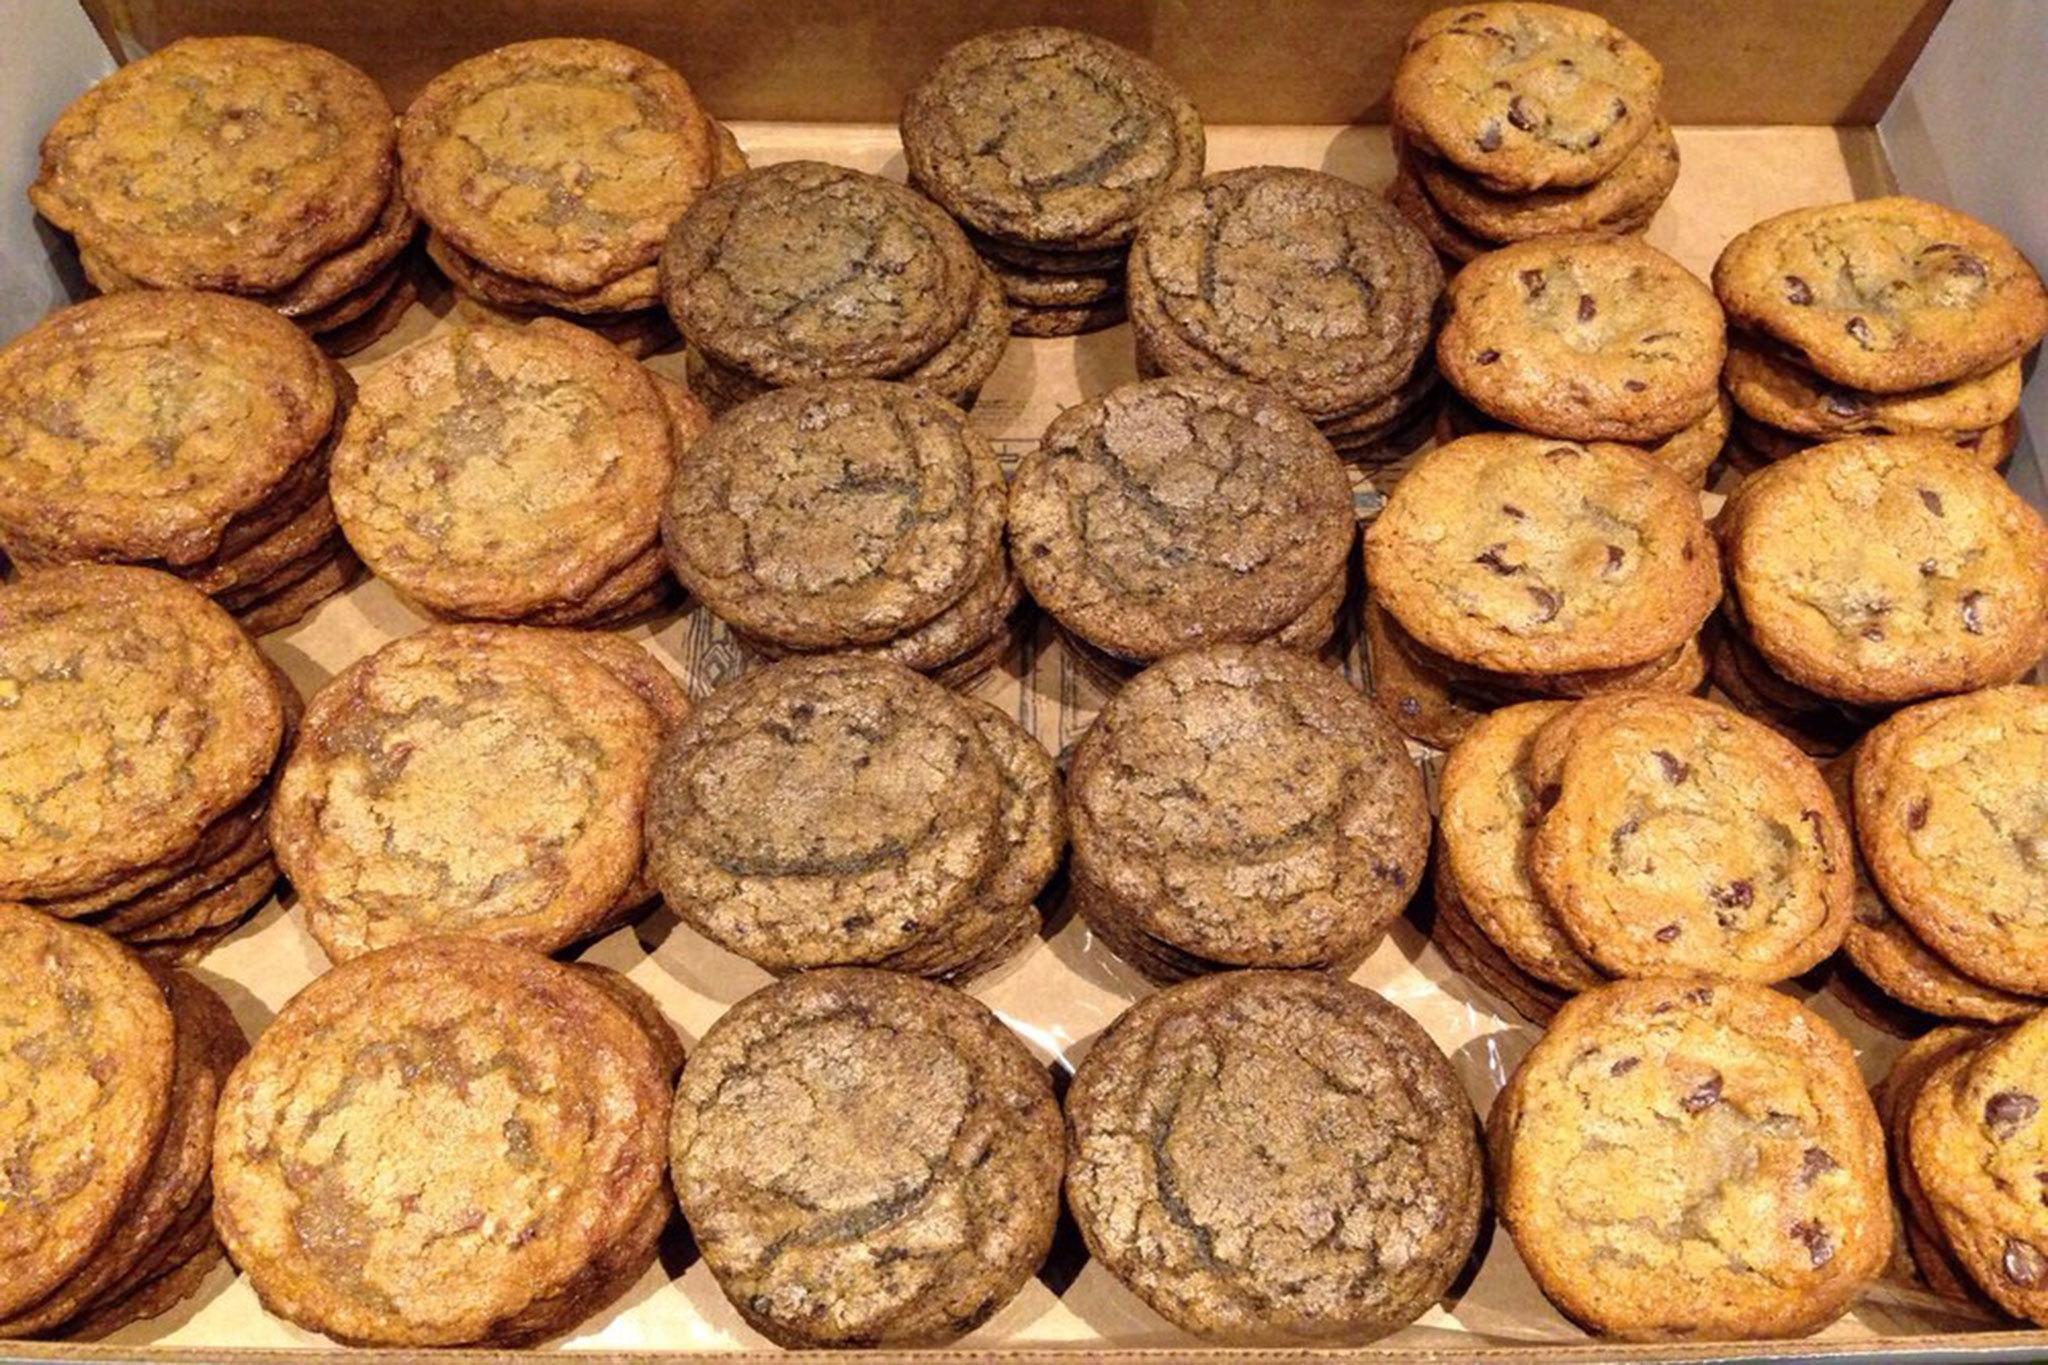 Cookies Hd Background